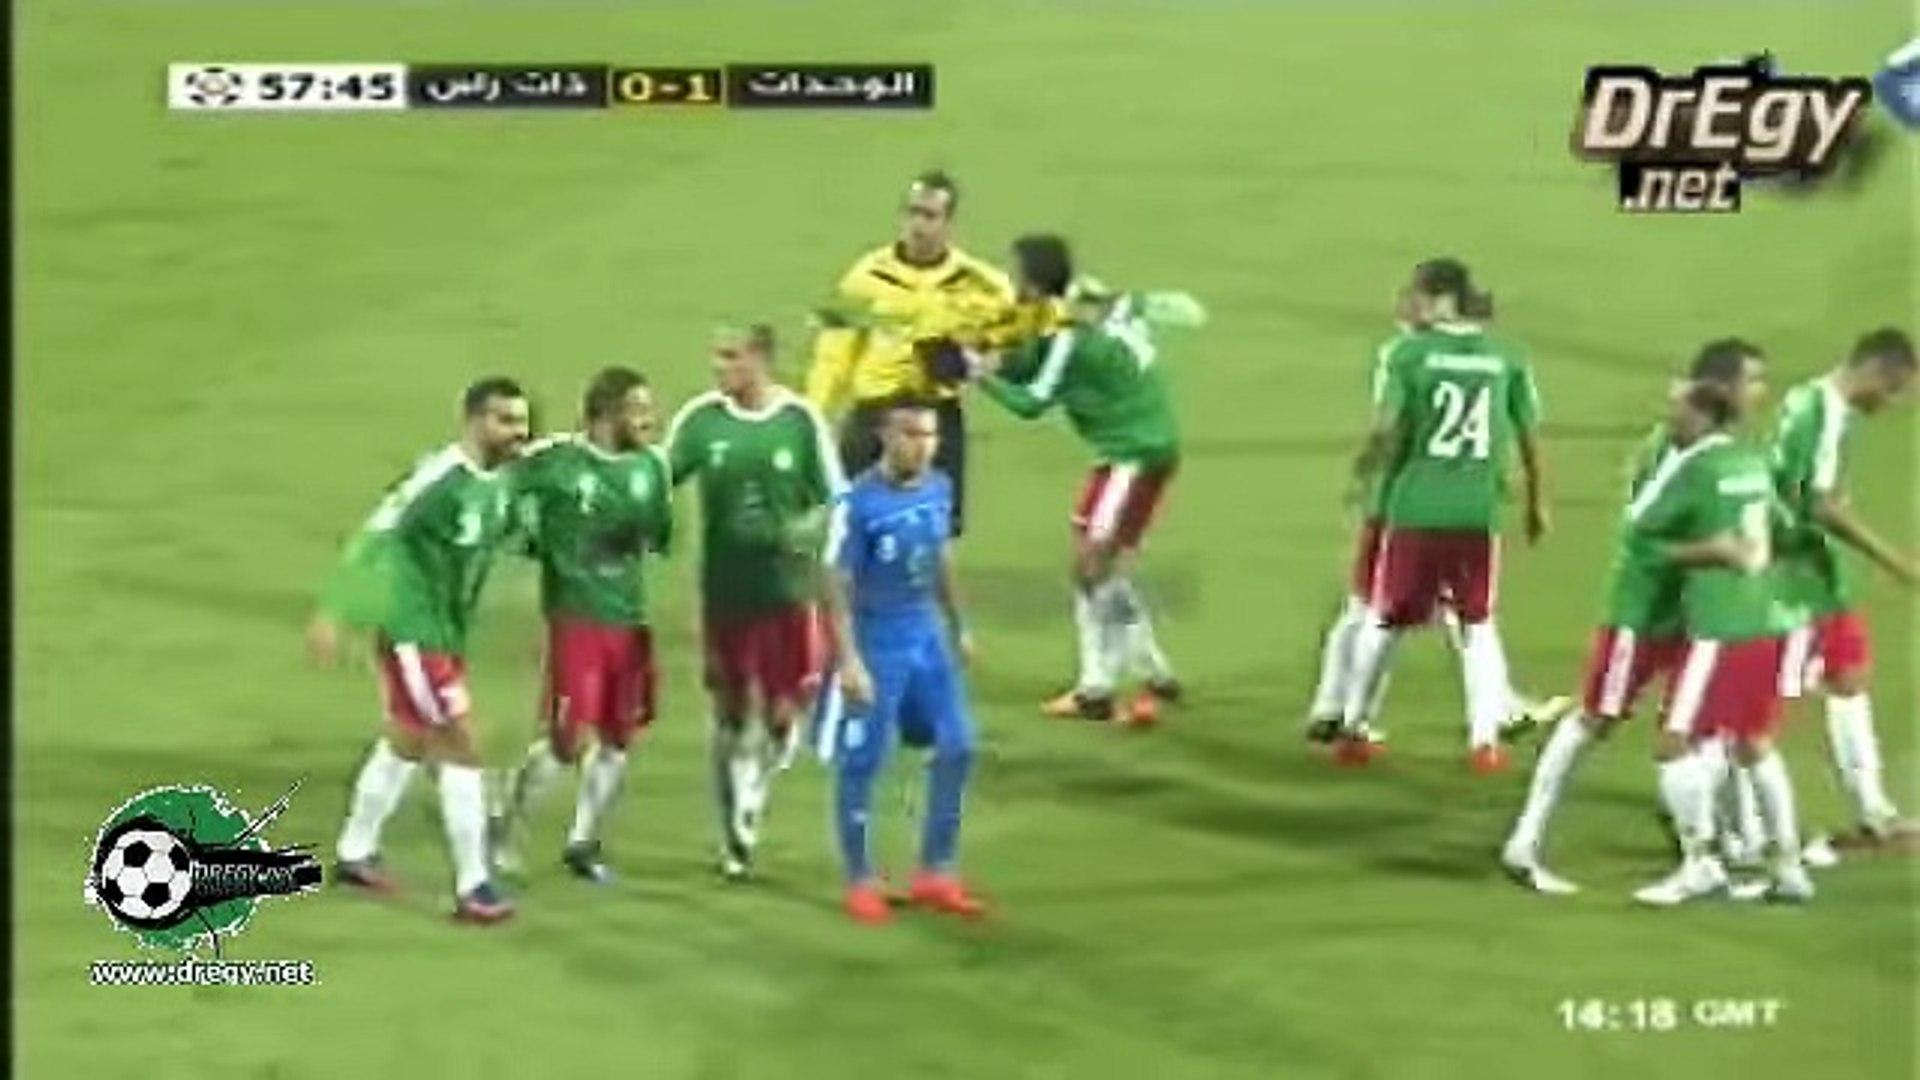 اهداف مباراة الوحدات و ذات راس 3-0 كاس الاردن